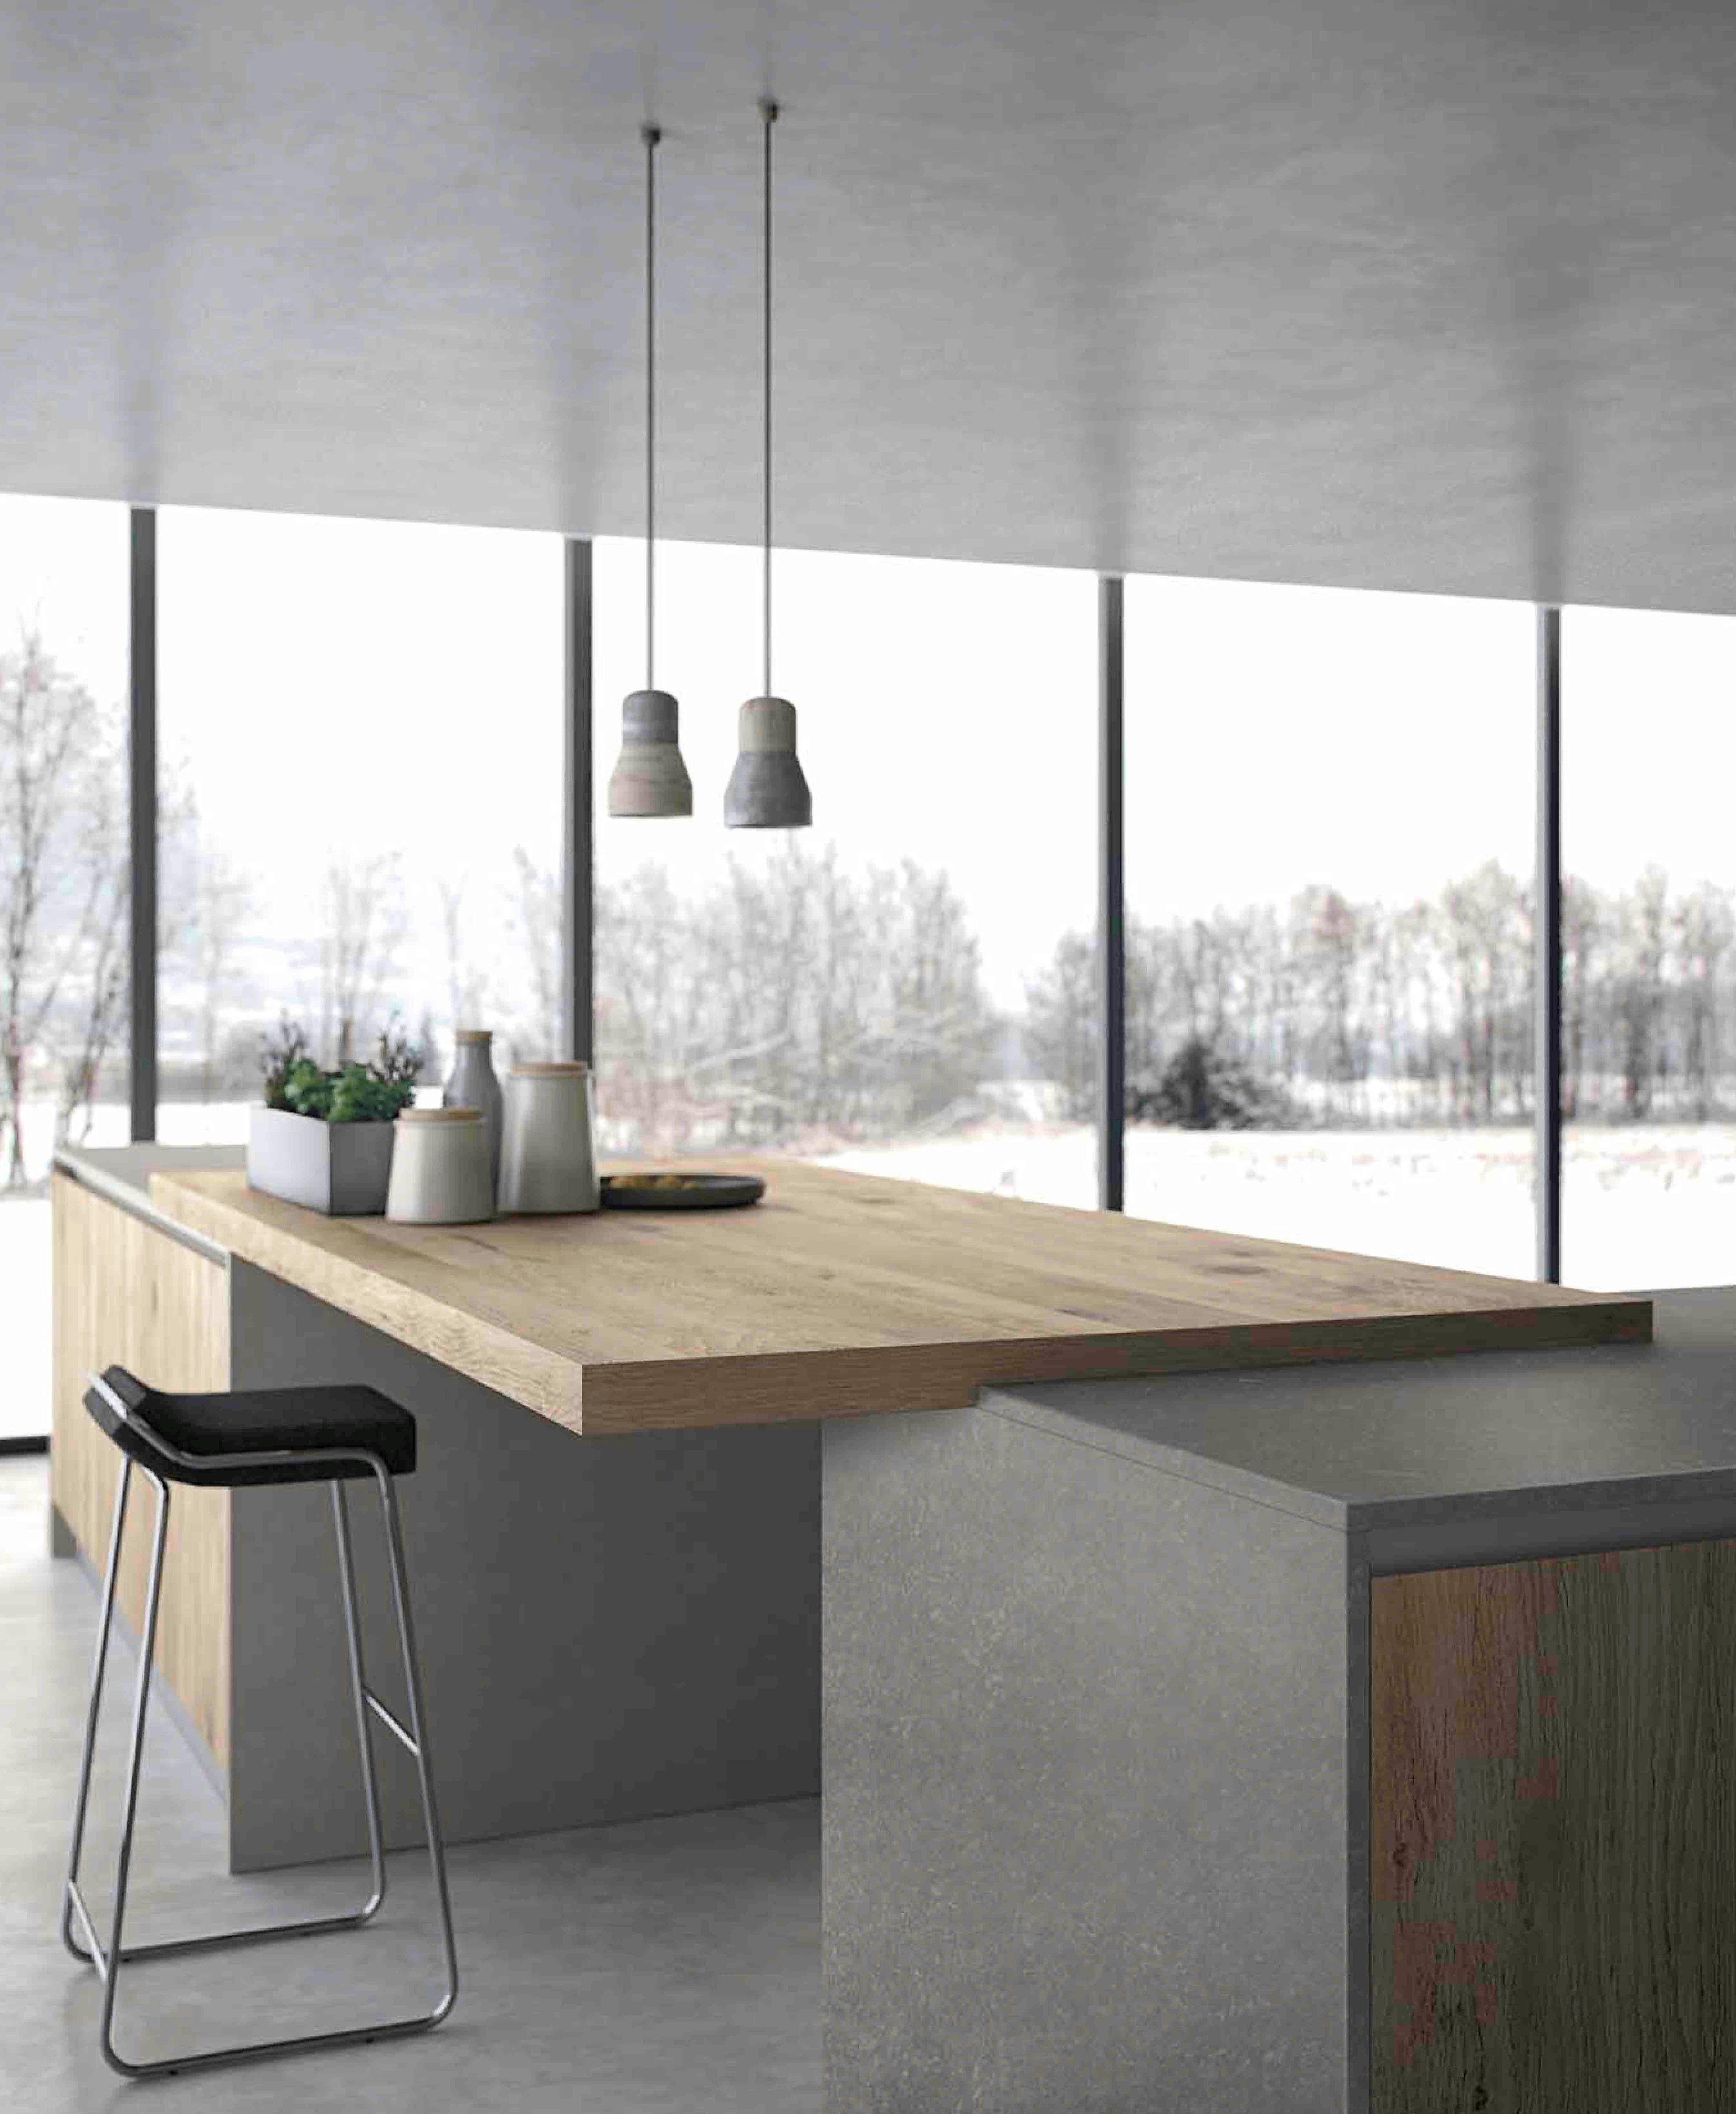 Idee Arredo Cucina In 2020 Kitchen Interior Contemporary Kitchen Home